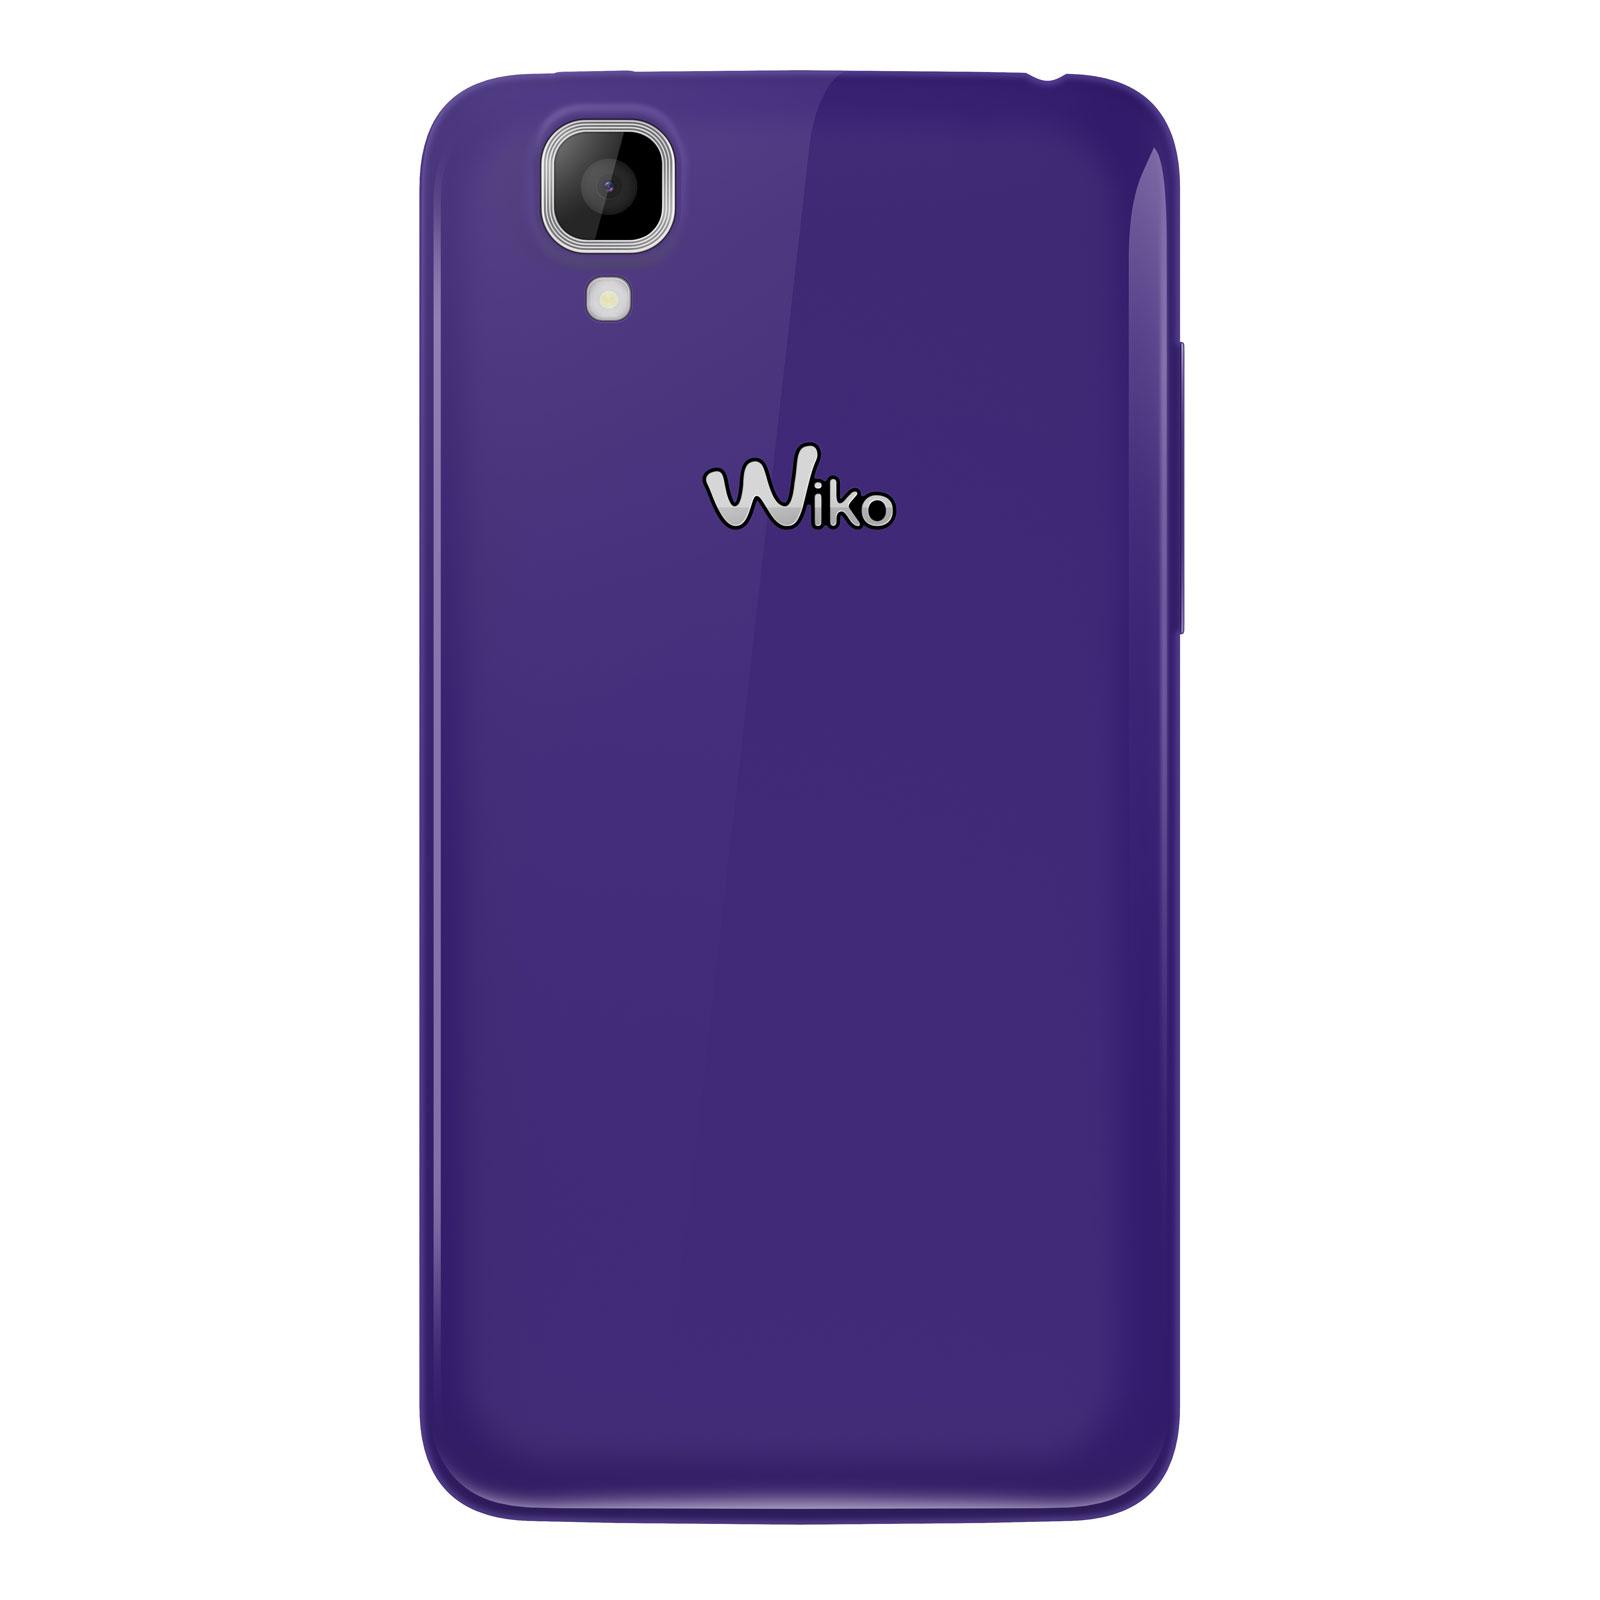 Wiko goa violet mobile smartphone wiko sur for Photo ecran wiko